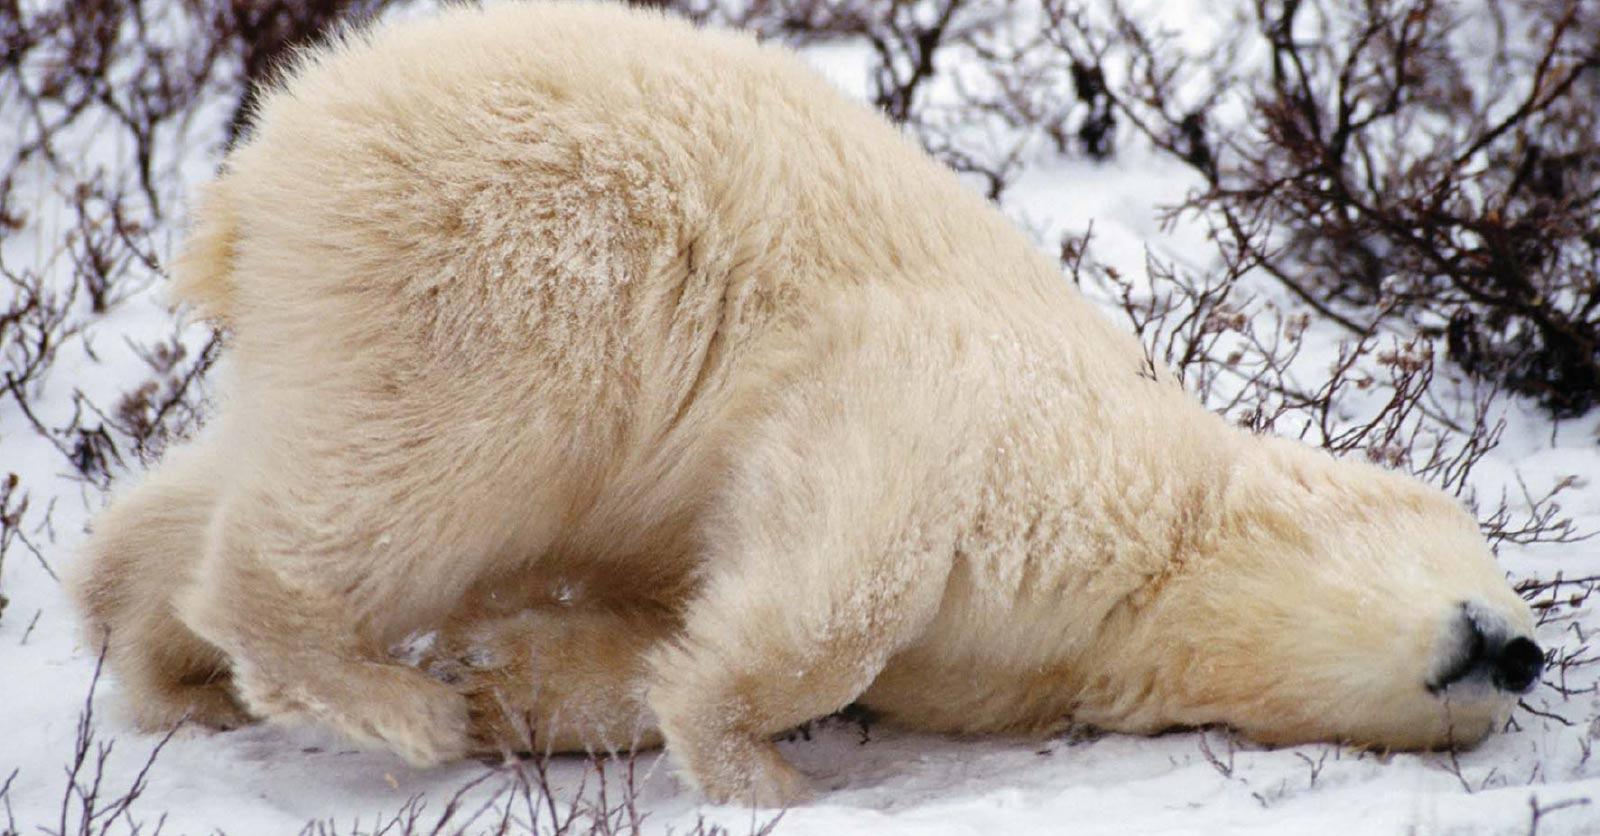 Balneum polar bear